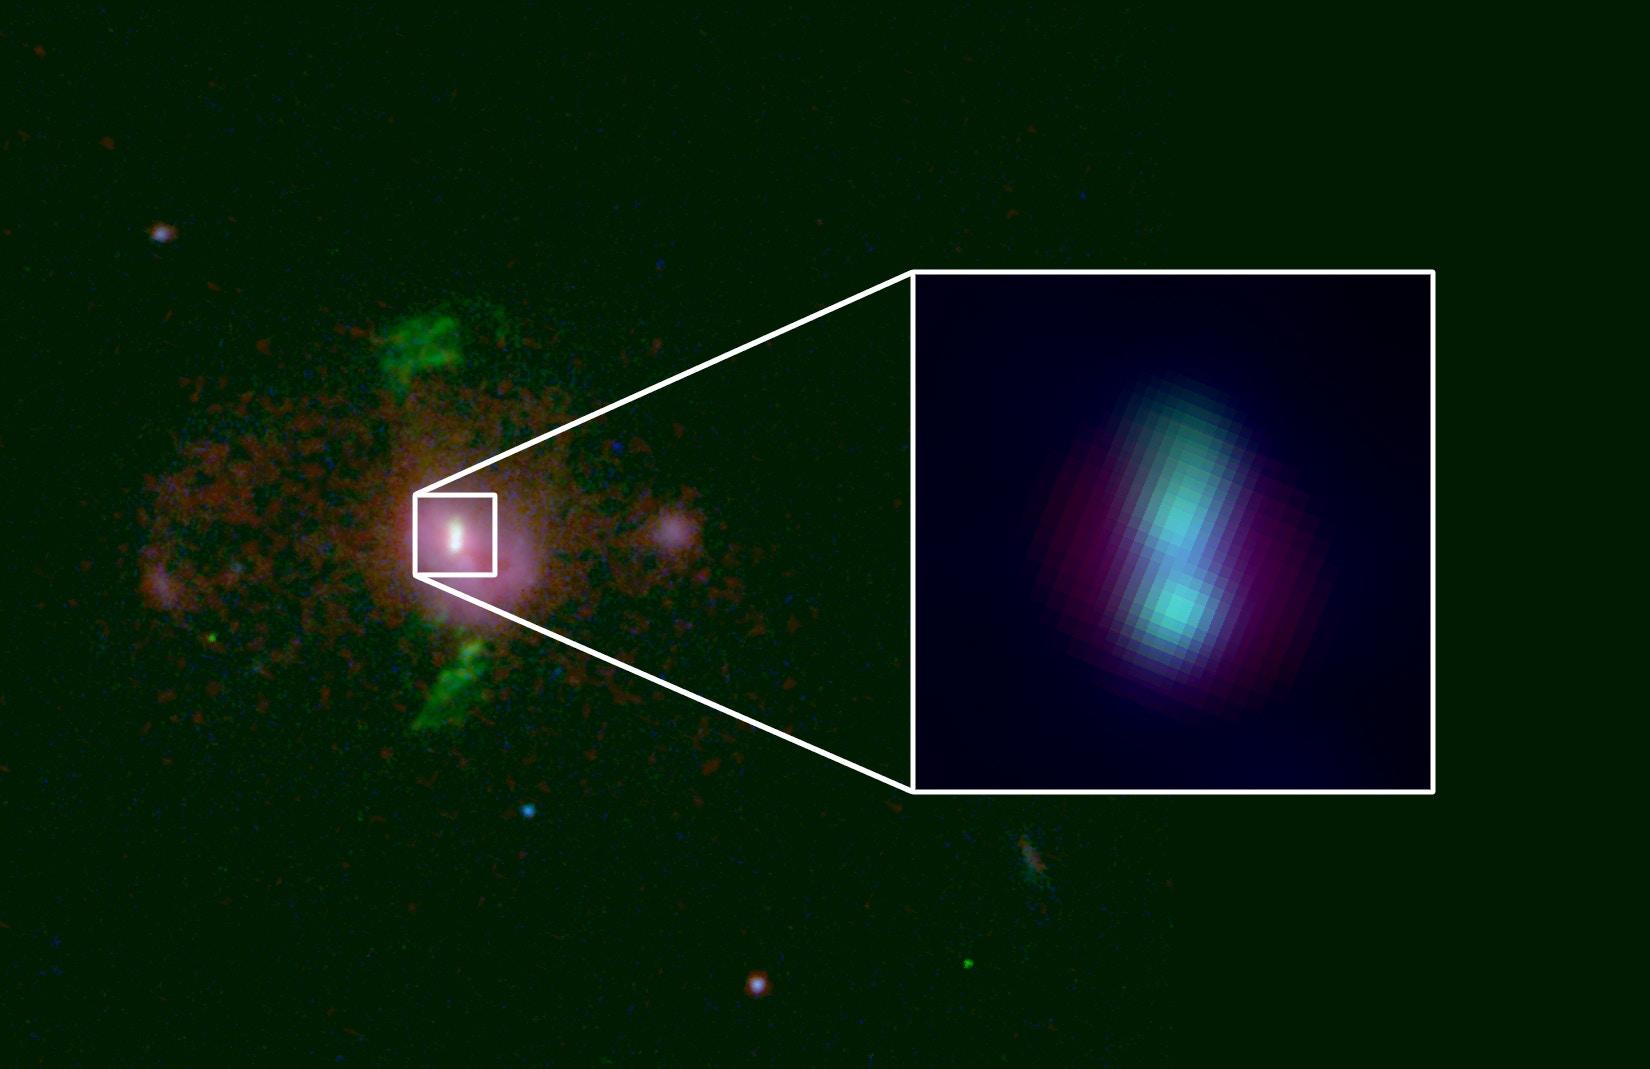 black holes brilliant math amp science wiki - HD1440×932